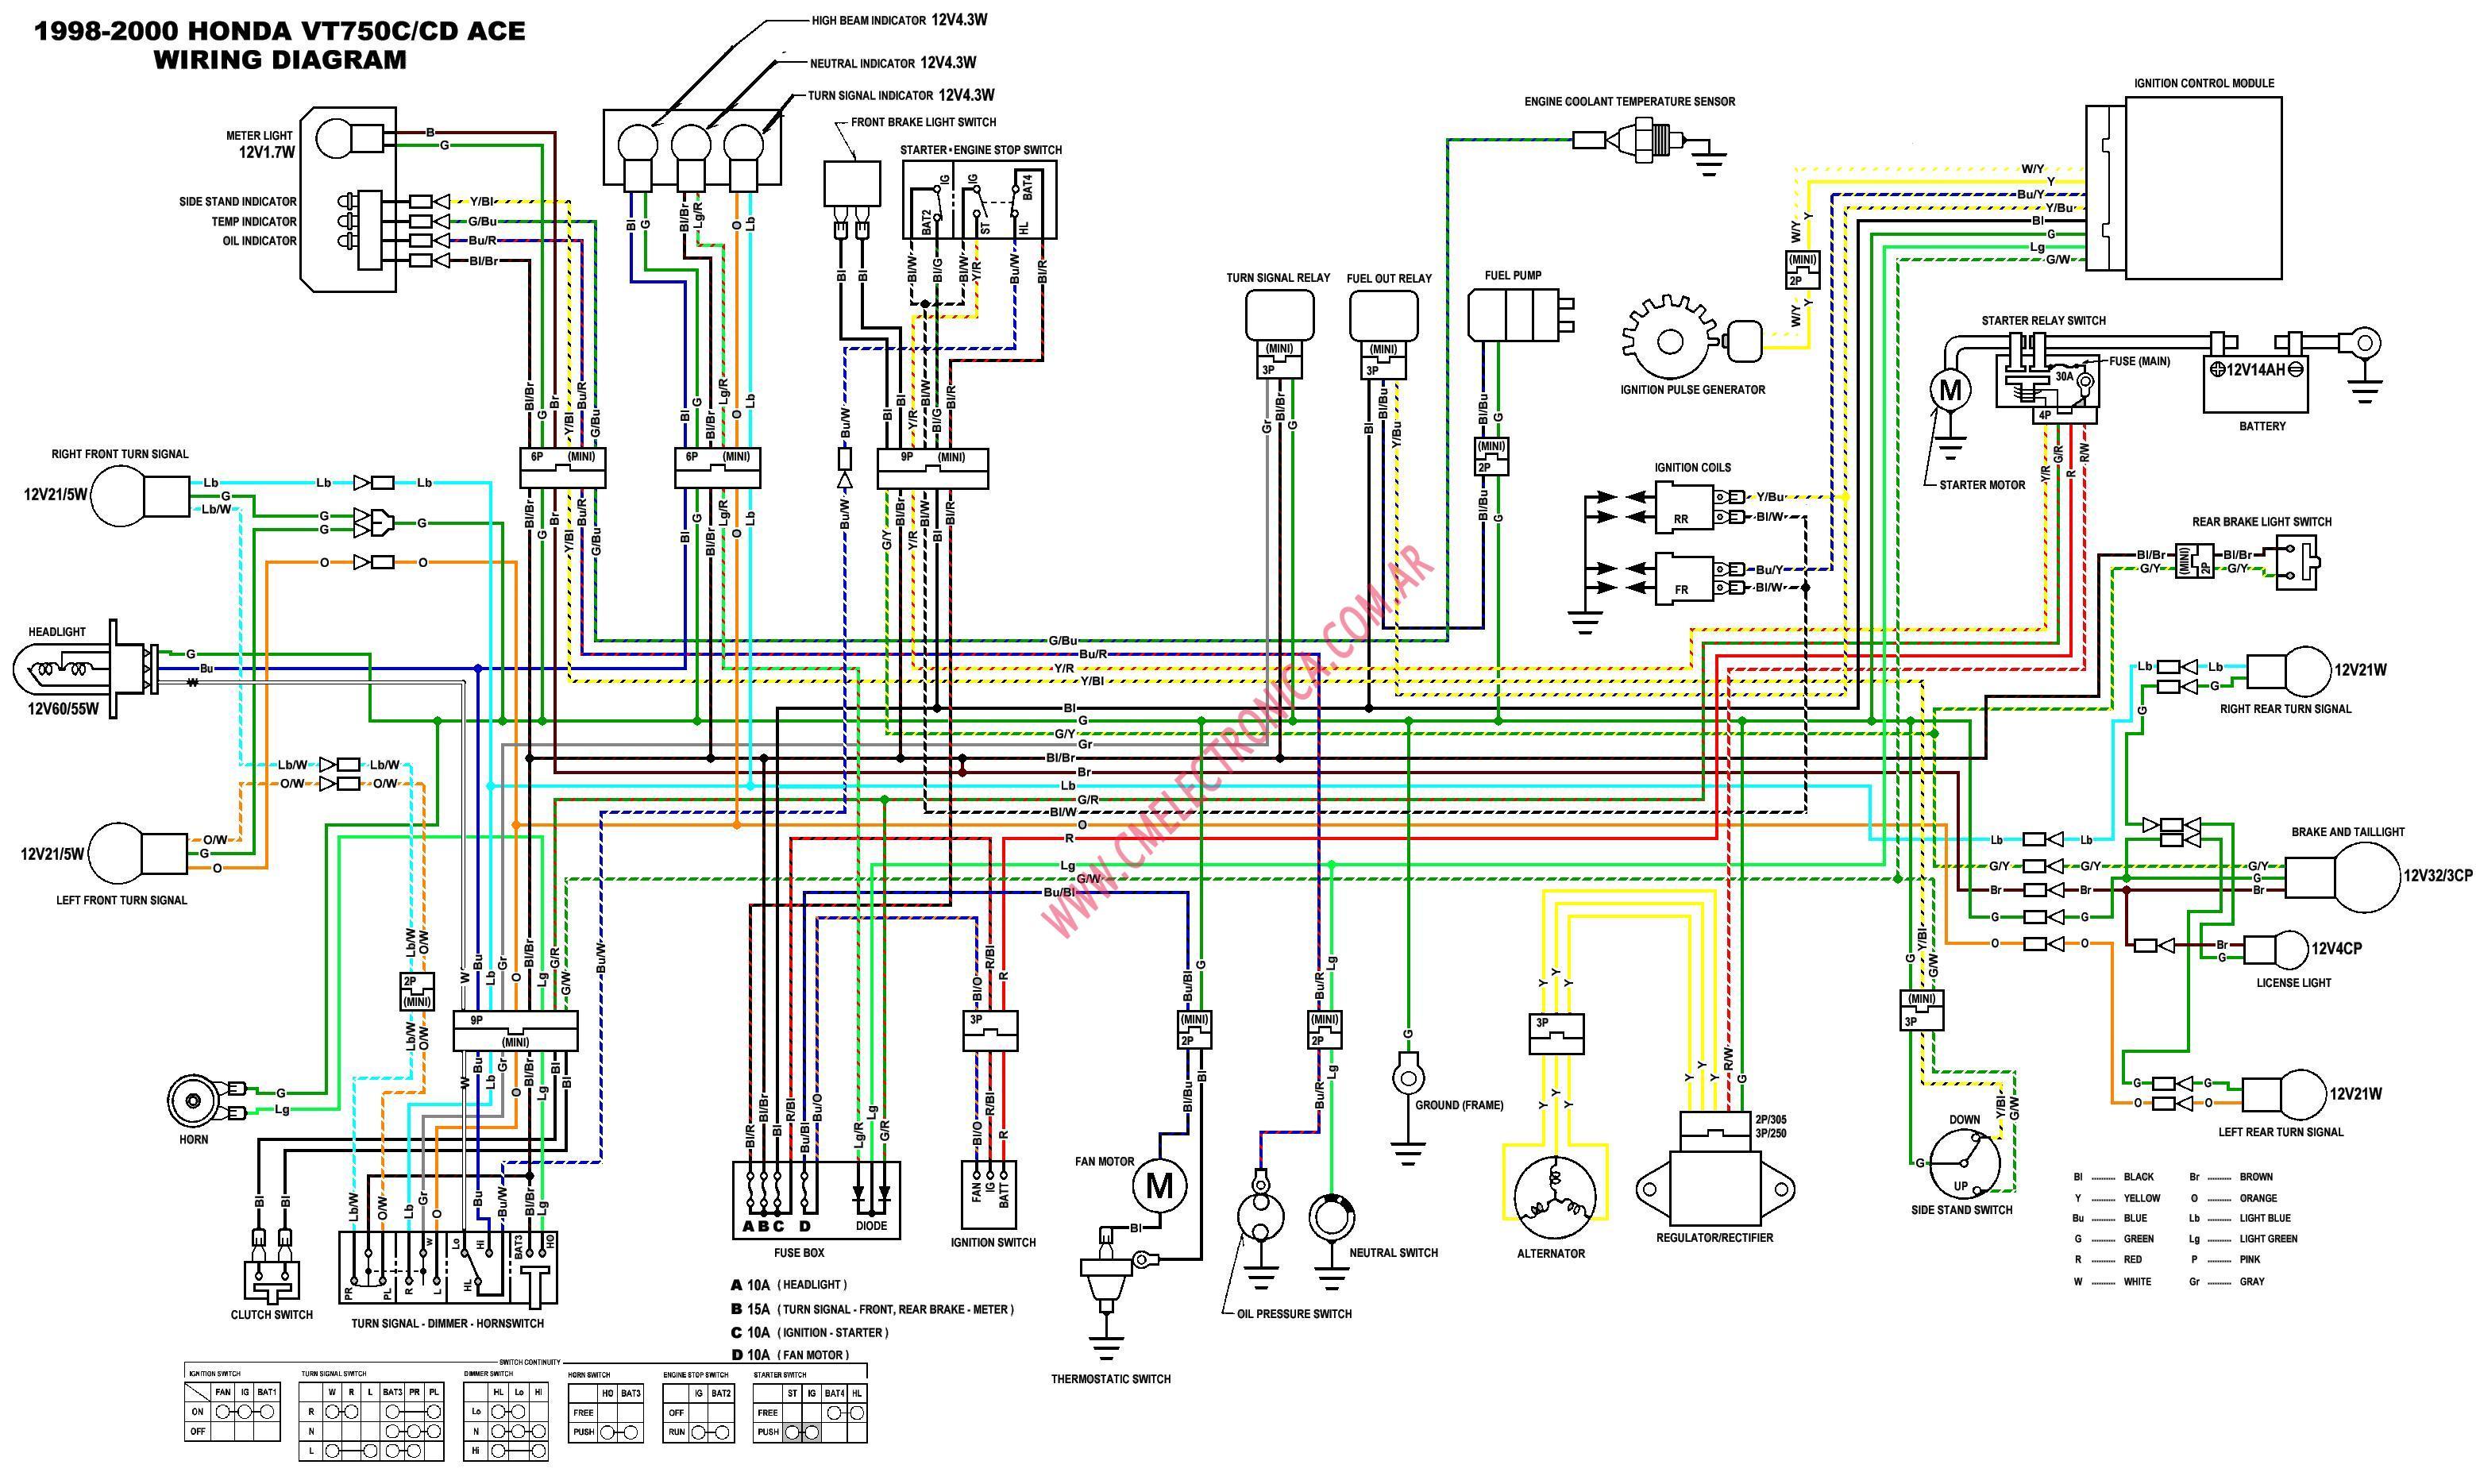 357 1976 honda xl250 wiring diagram | wiring resources  wiring resources